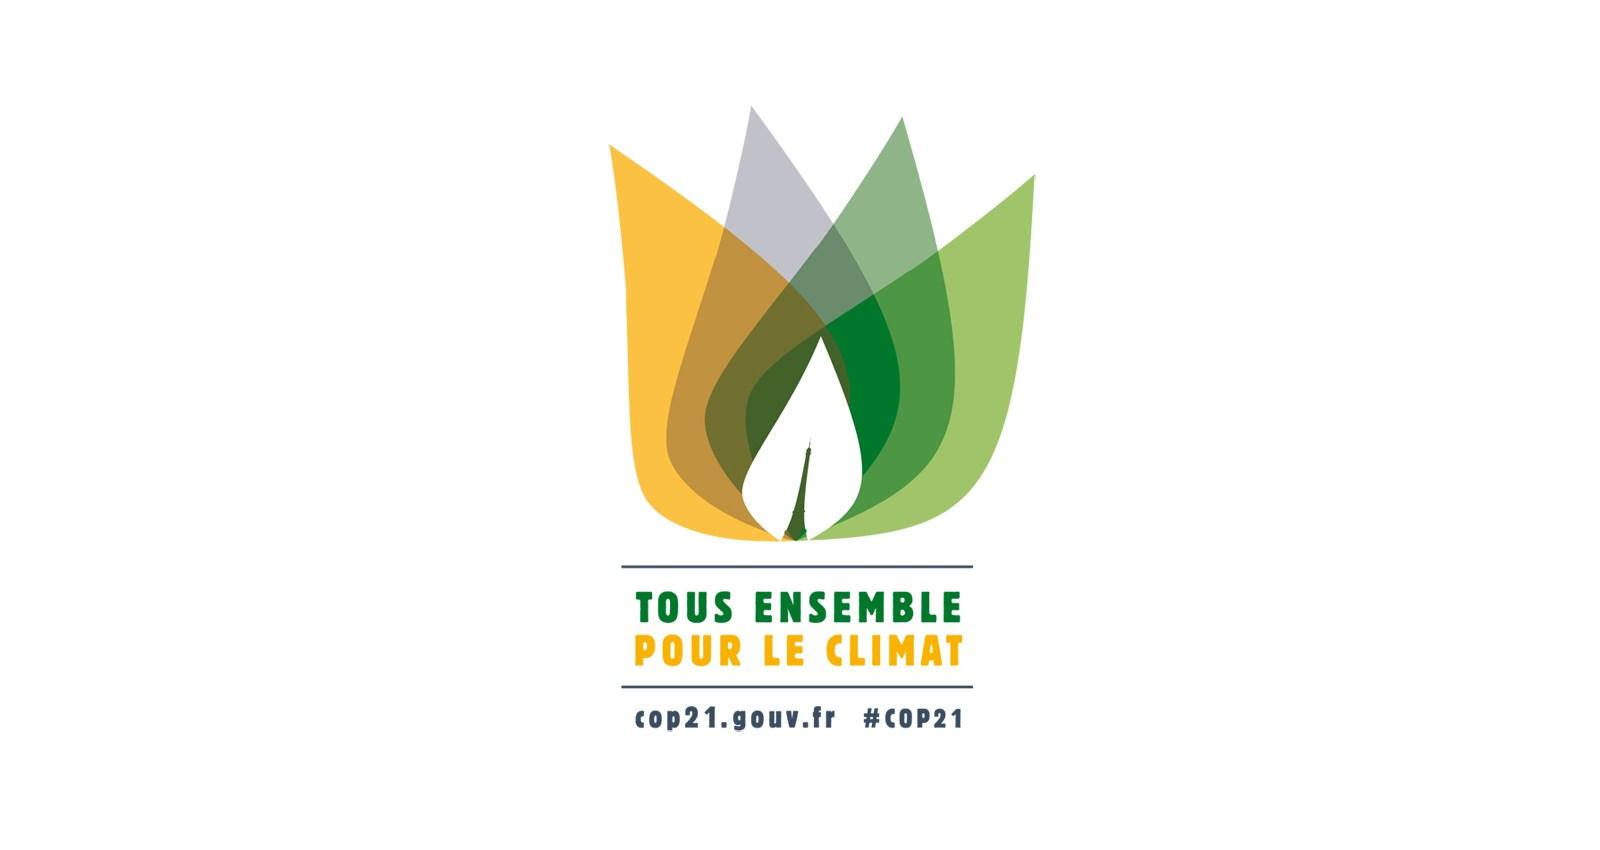 COP21: cinque domande e cinque risposte